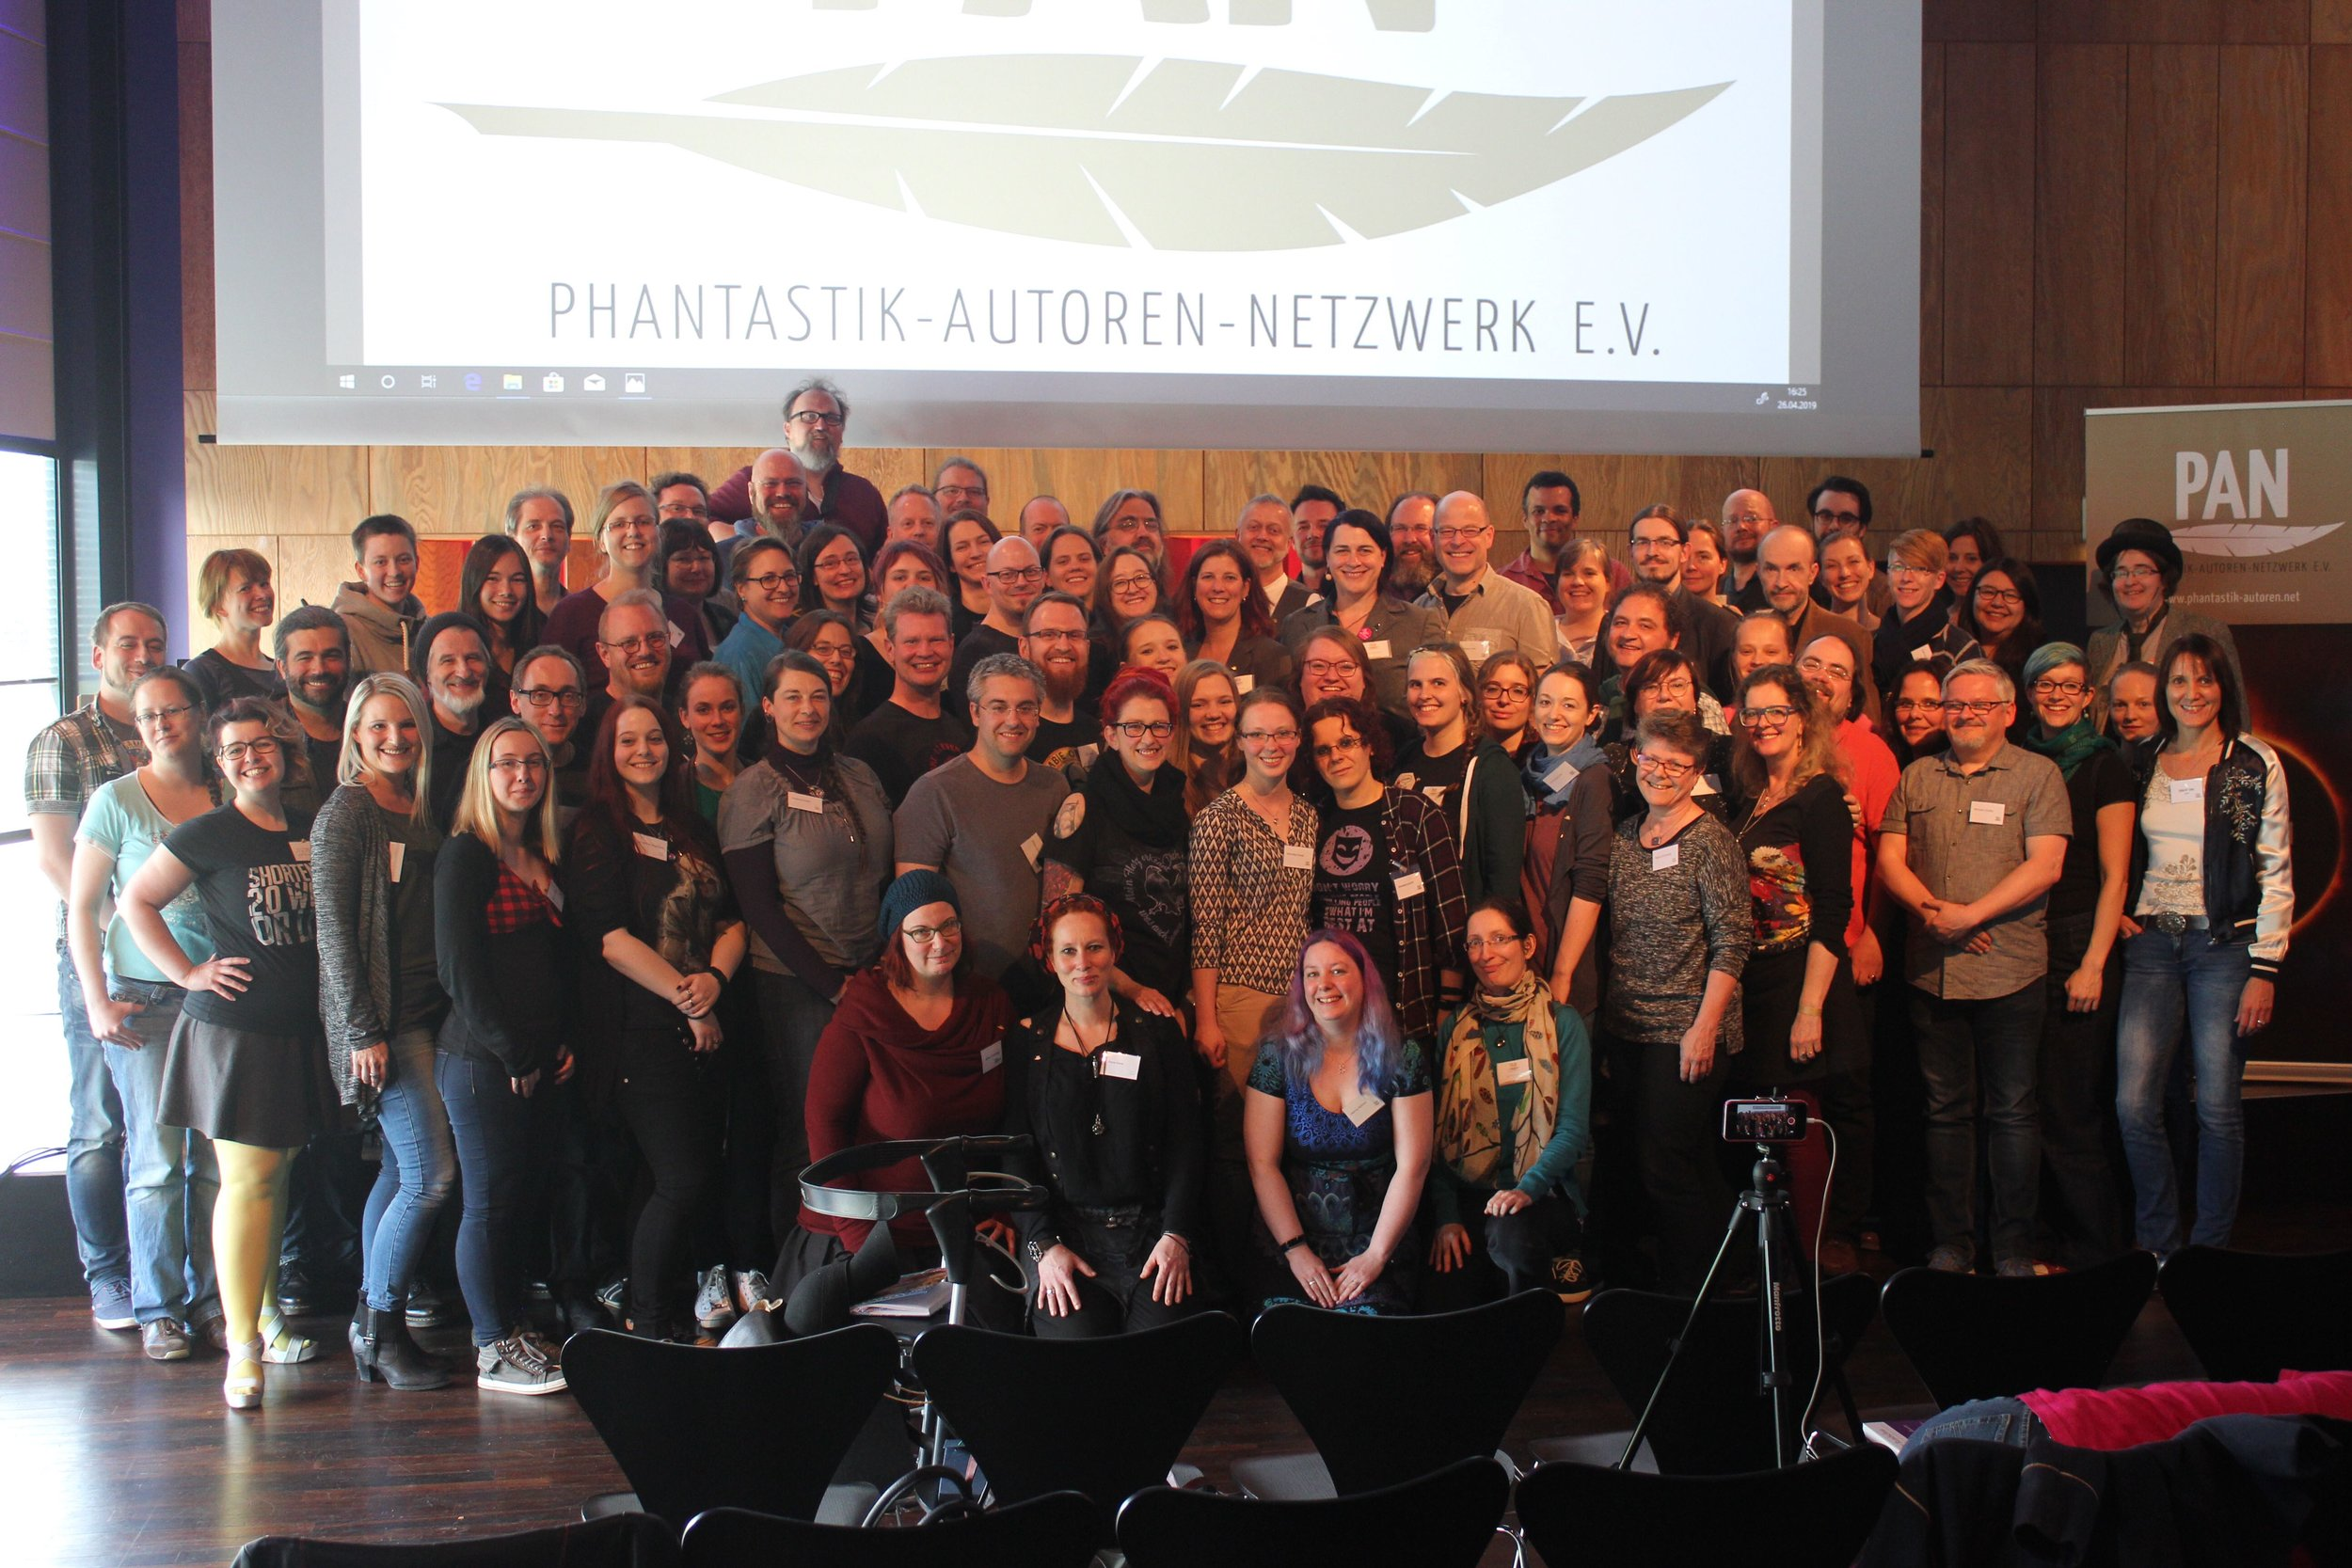 Phantastik-Autoren-Netzwerk (PAN) e.V.